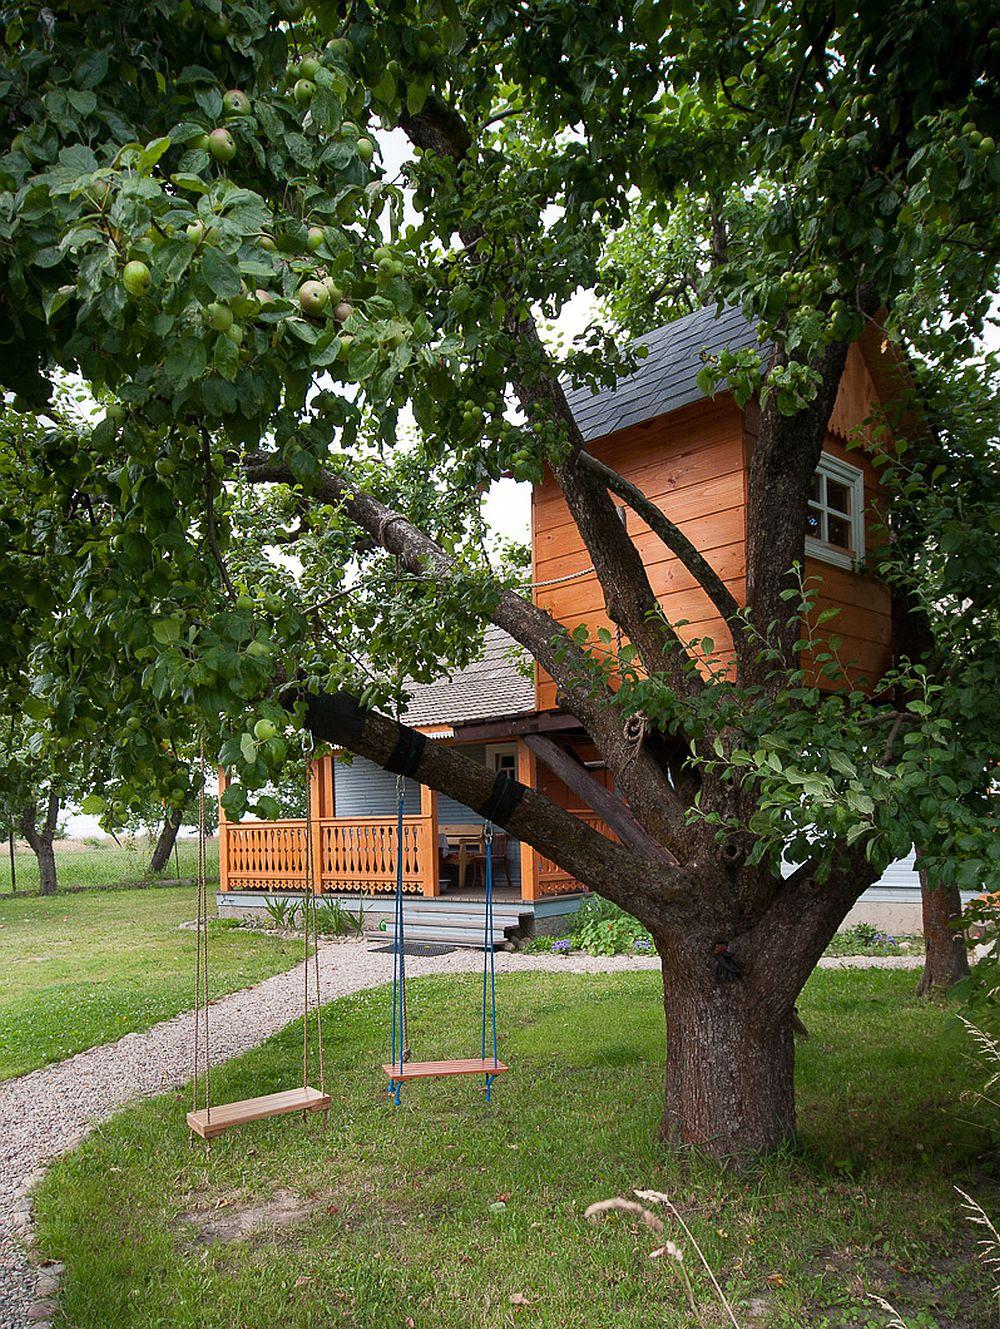 adelaparvu.com despre casa rustica Polonia, pensiune agroturisitica Korolowa Chata  (3)